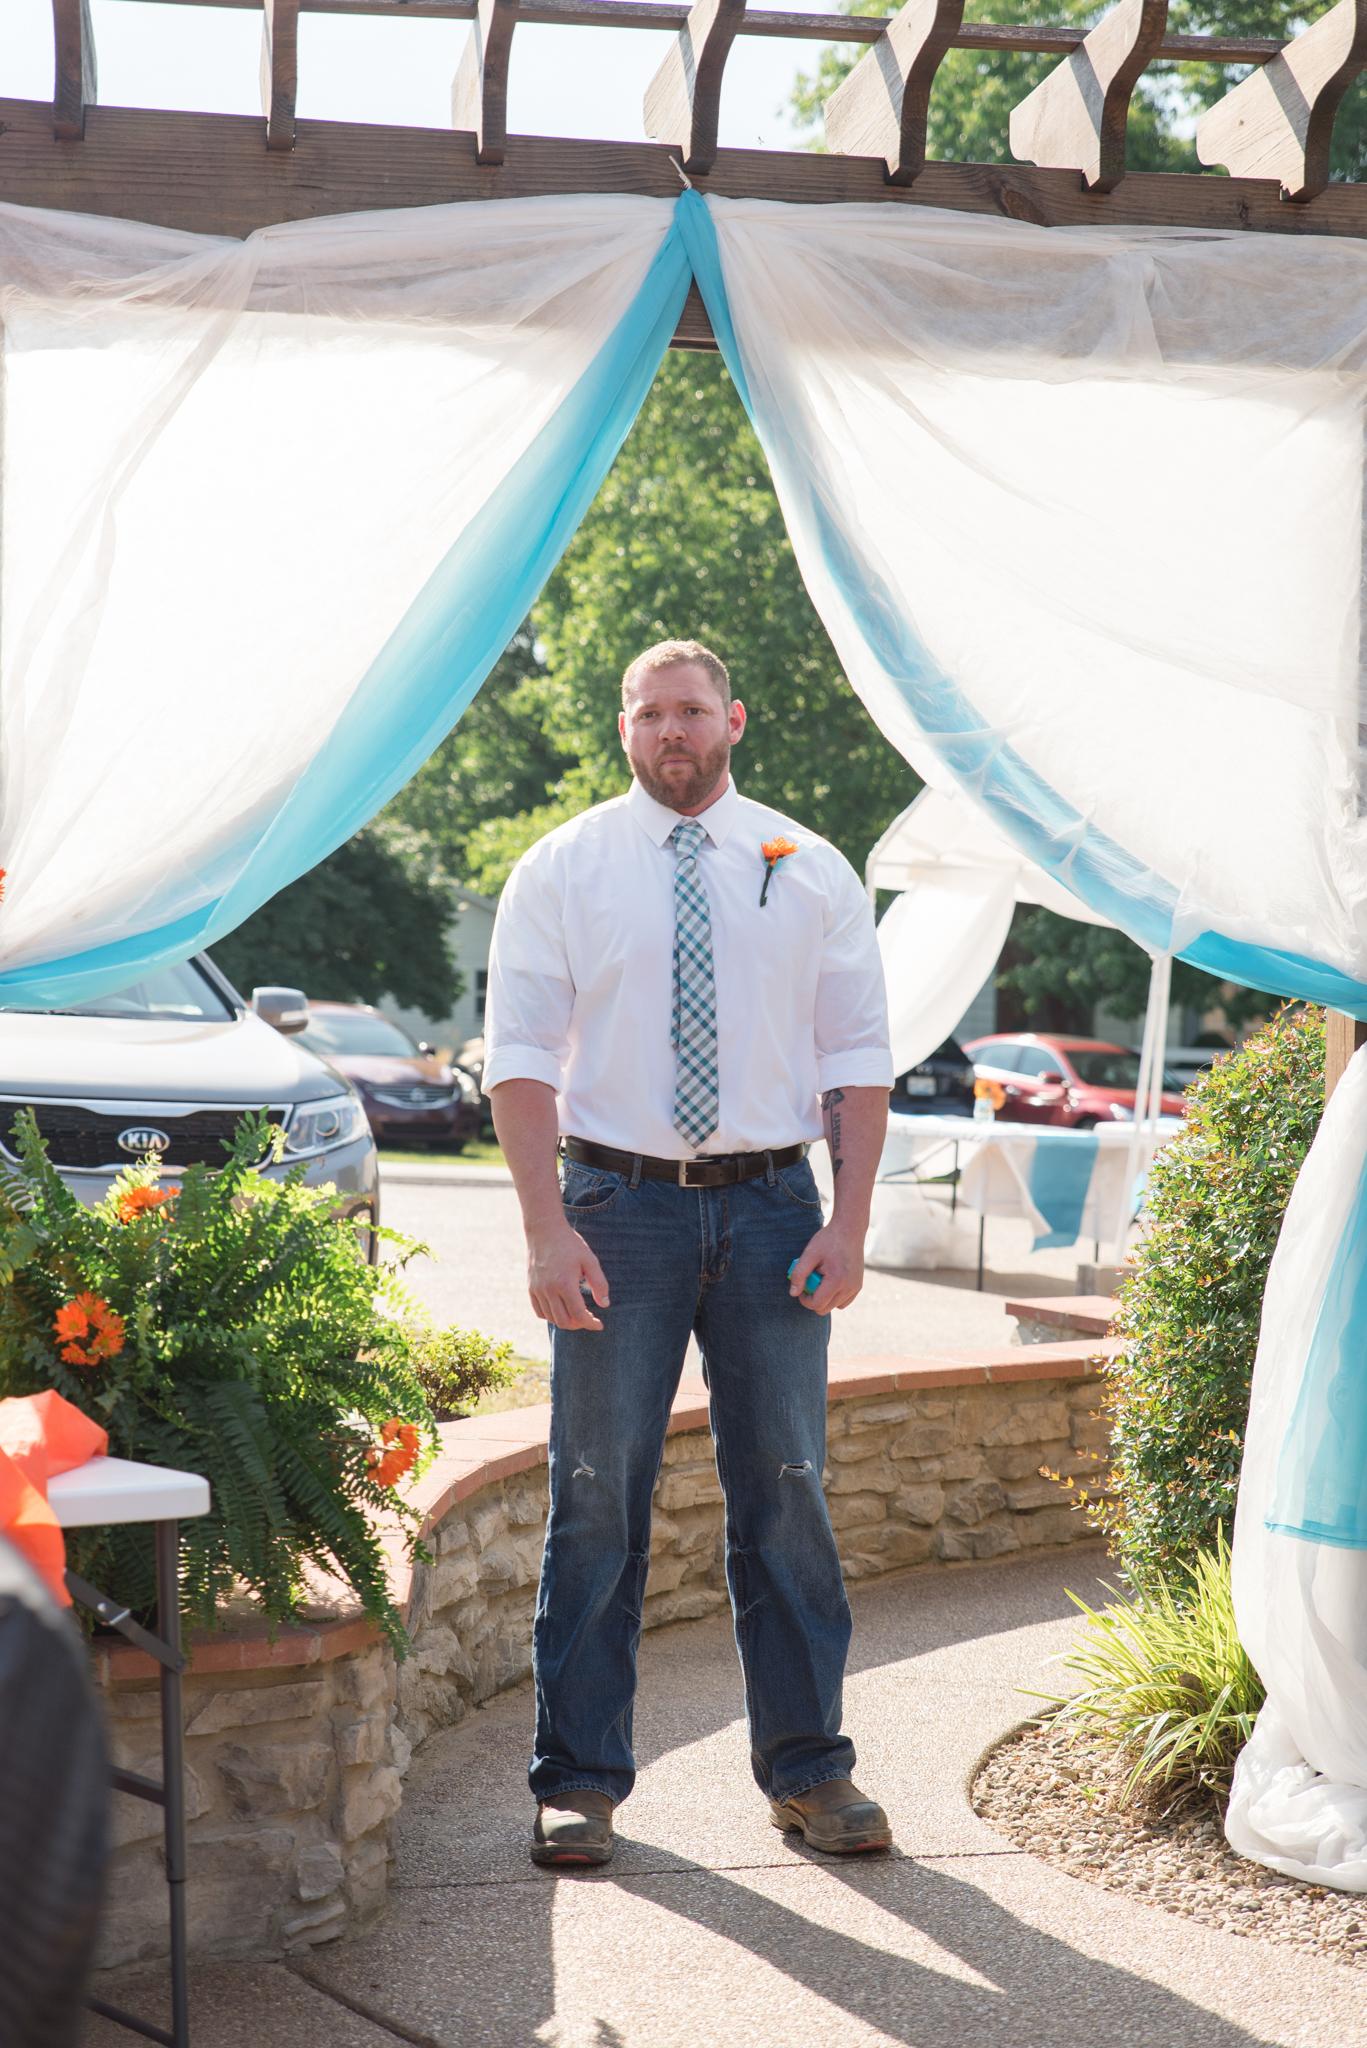 Winchester Ky Wedding photographer, KY Wedding, KY Bride, kentucky wedding photography